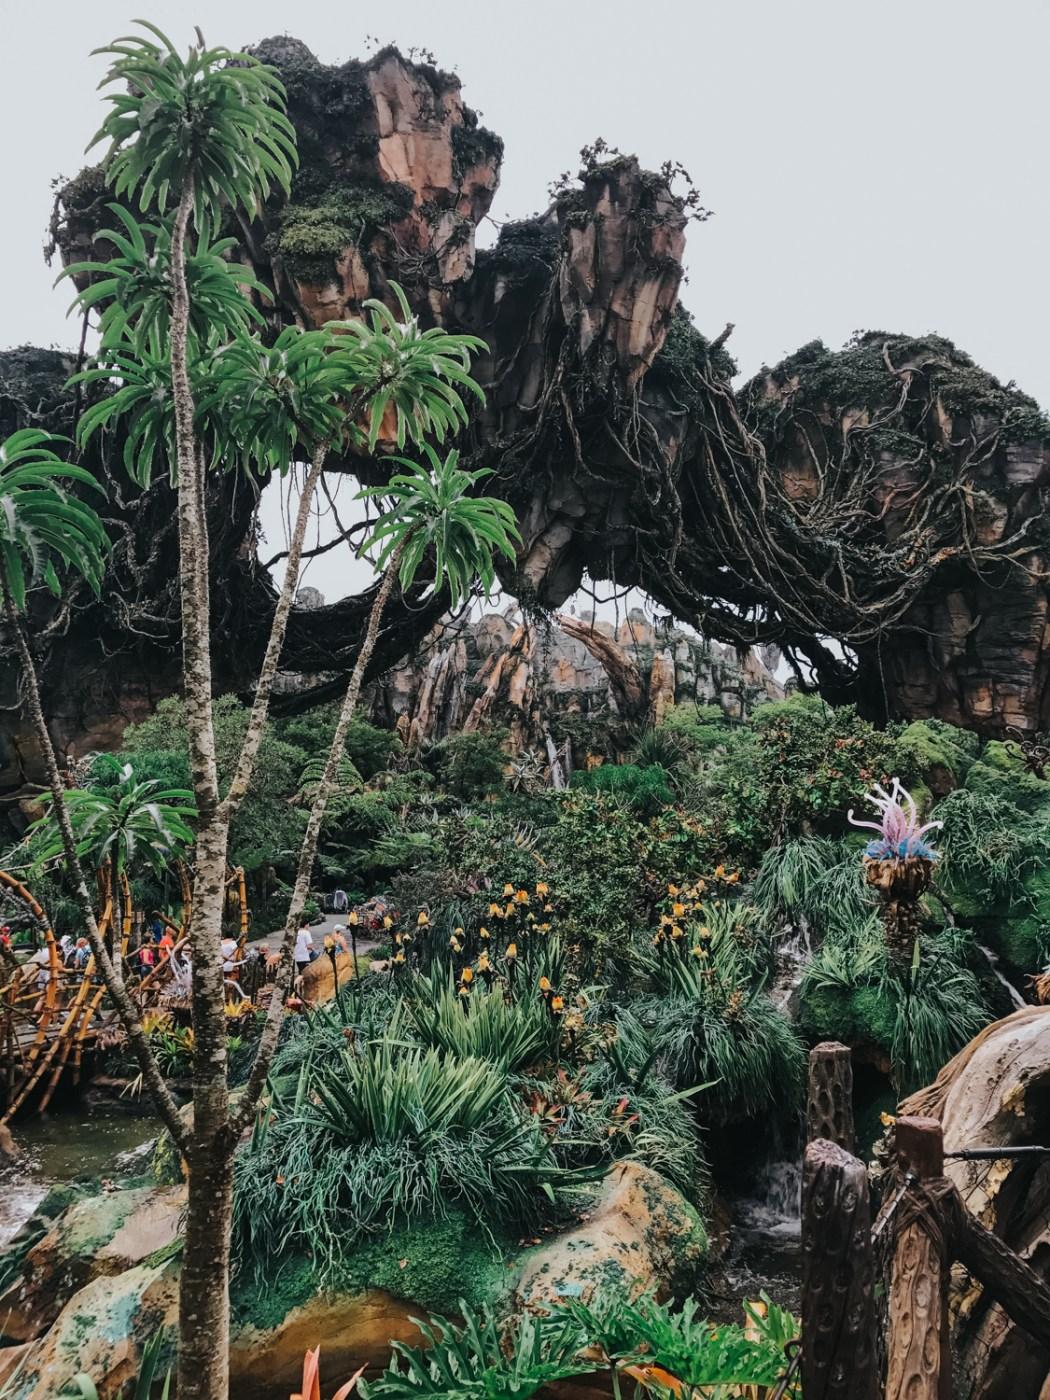 Floating rock inside Disney's Pandora: The World of Avatar